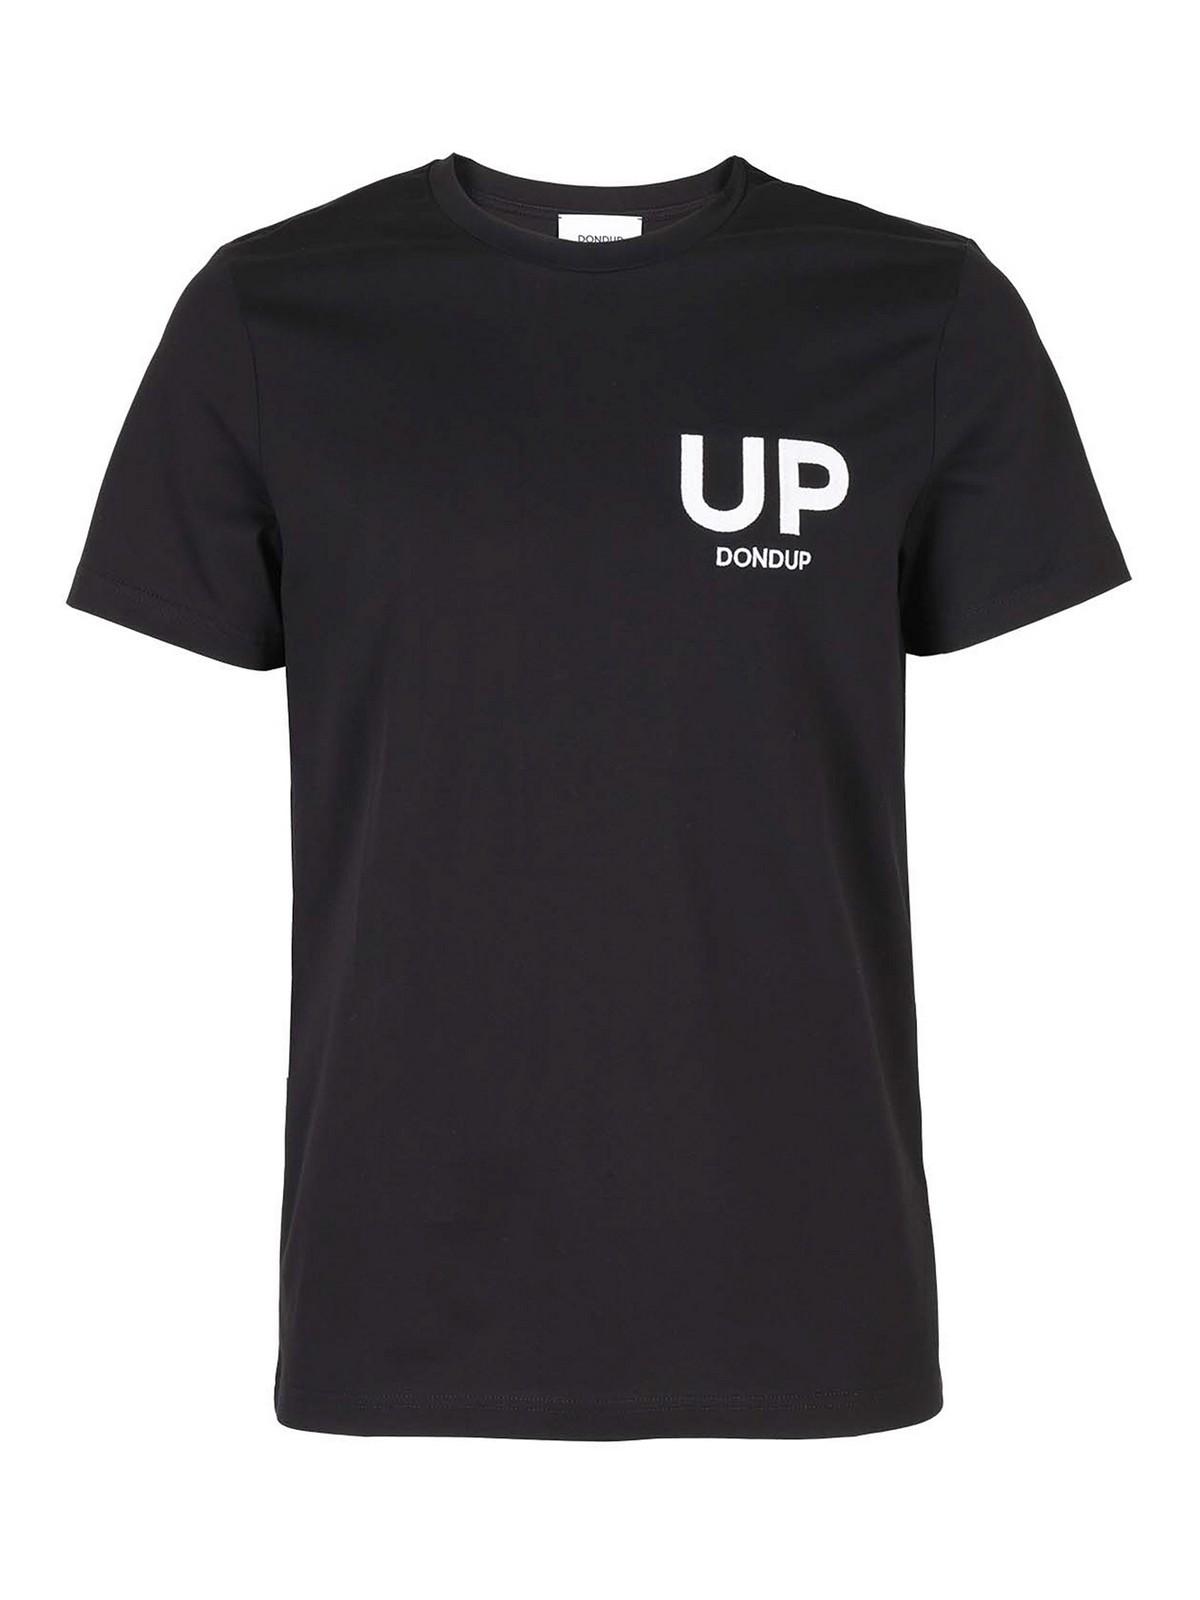 Dondup T-shirts UP T-SHIRT